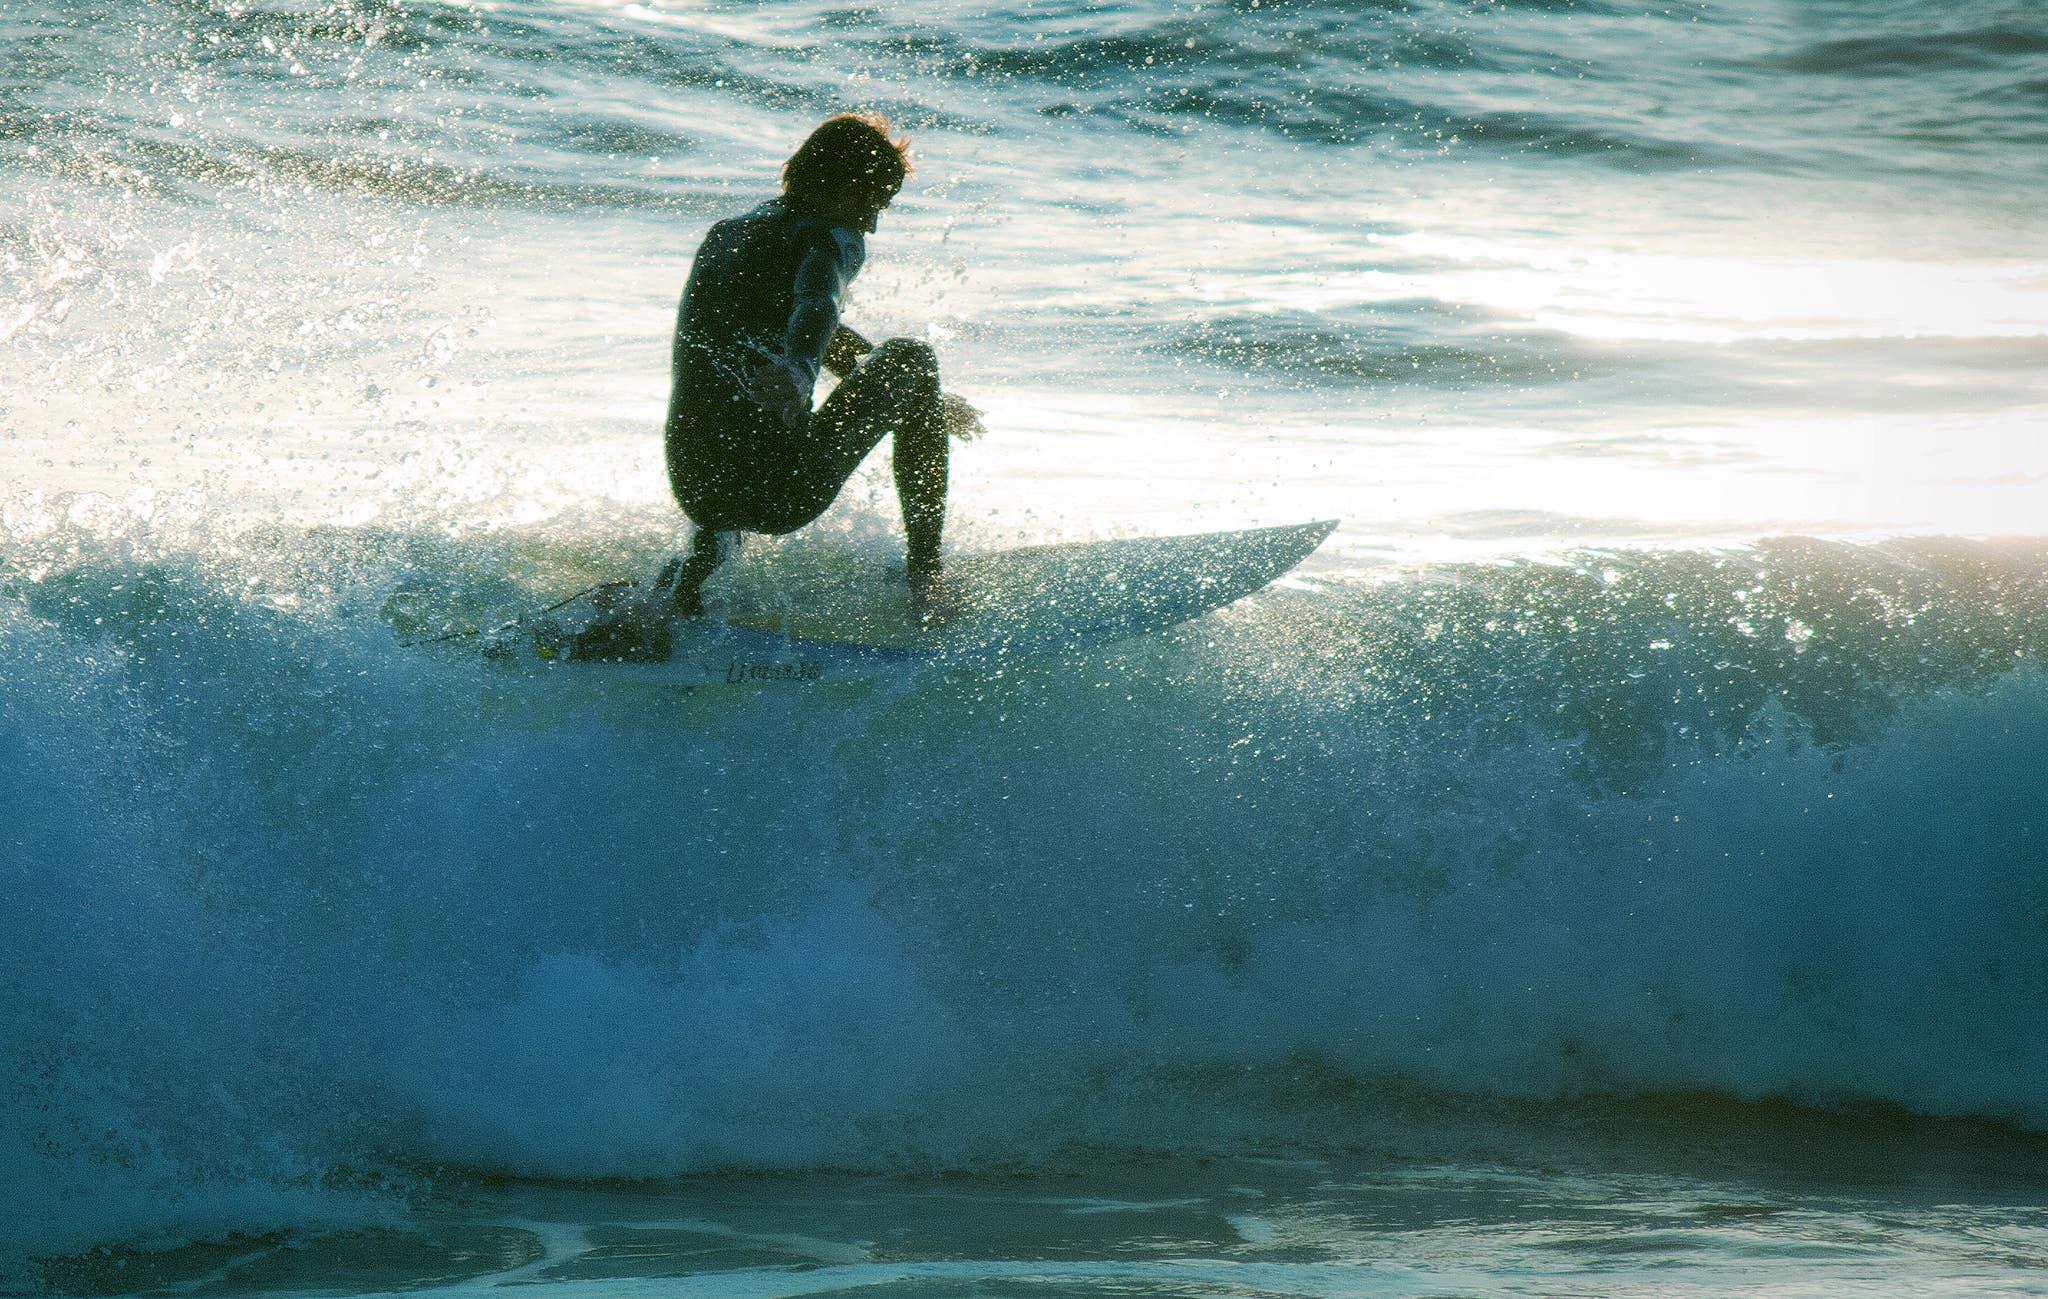 El Porto Manhattan Beach Surfer